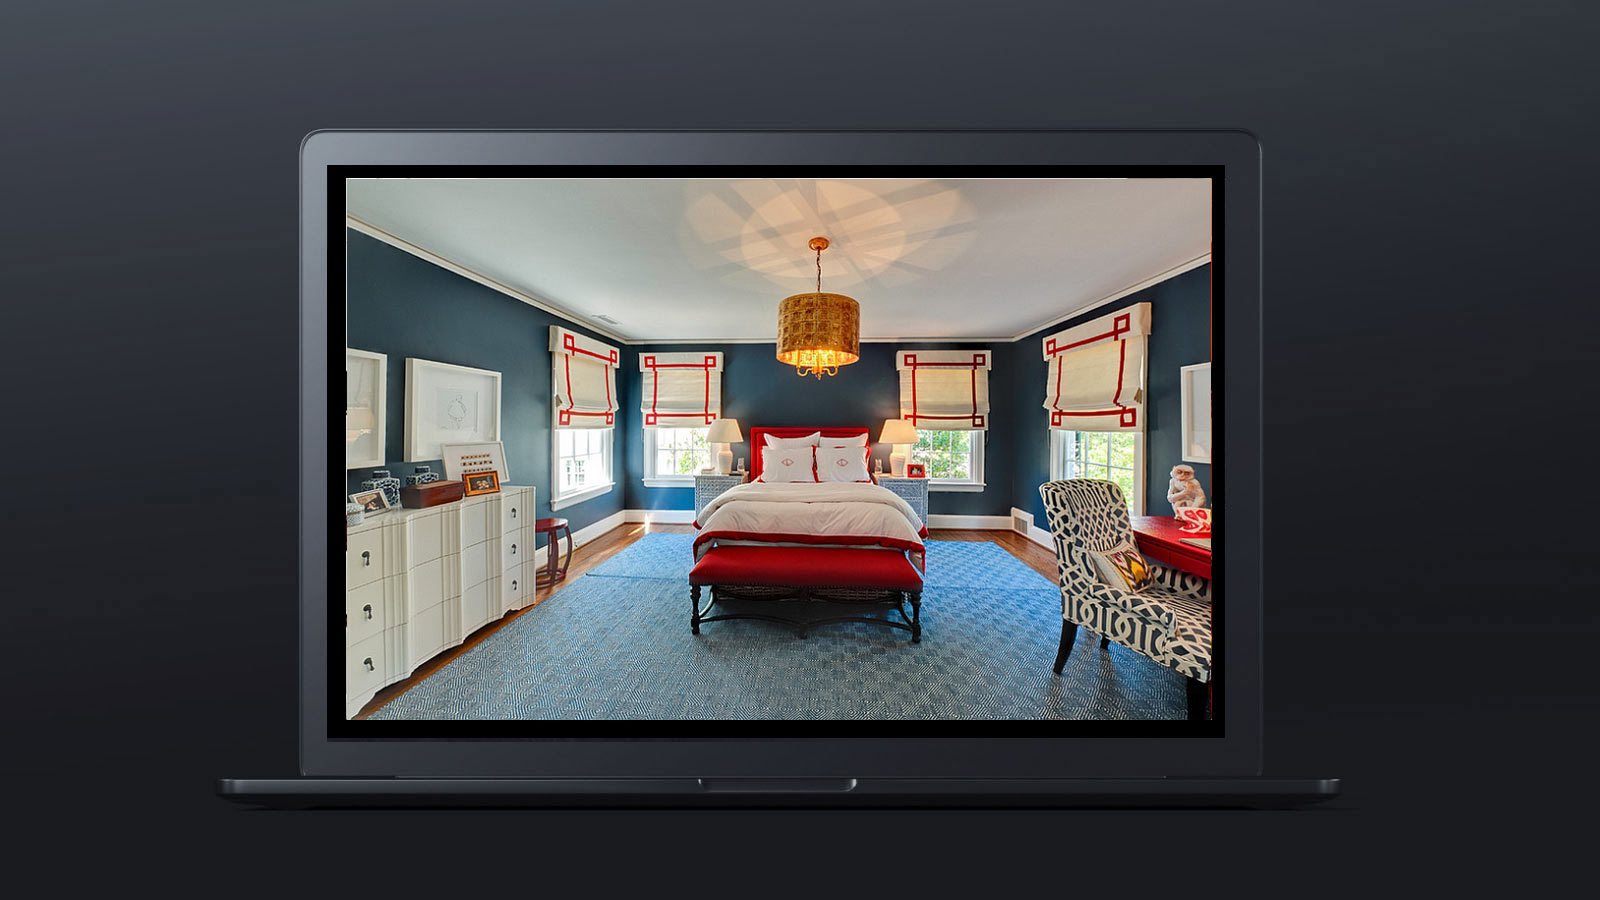 Design Color 19 - نقش رنگ و رنگ آمیزی در دکوراسیون داخلی